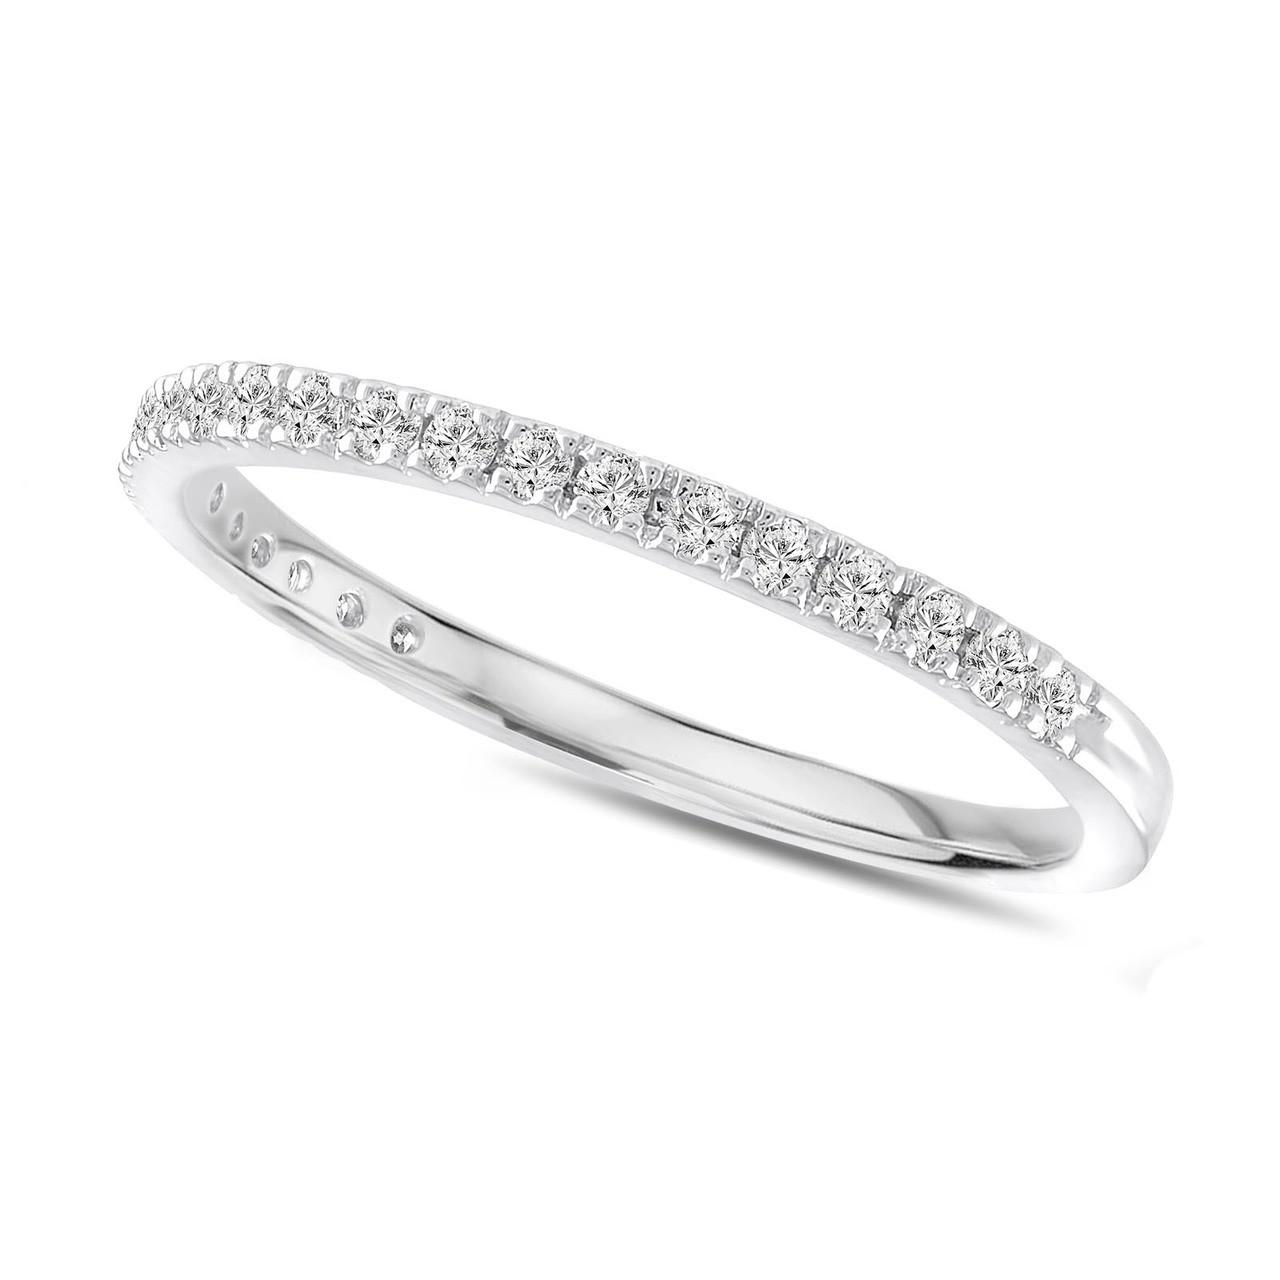 Pave Wedding Band.Pave Diamond Wedding Ring Platinum Thin Wedding Band Half Eternity Band 0 25 Carat Anniversary Ring Stackable Band Handmade Unique